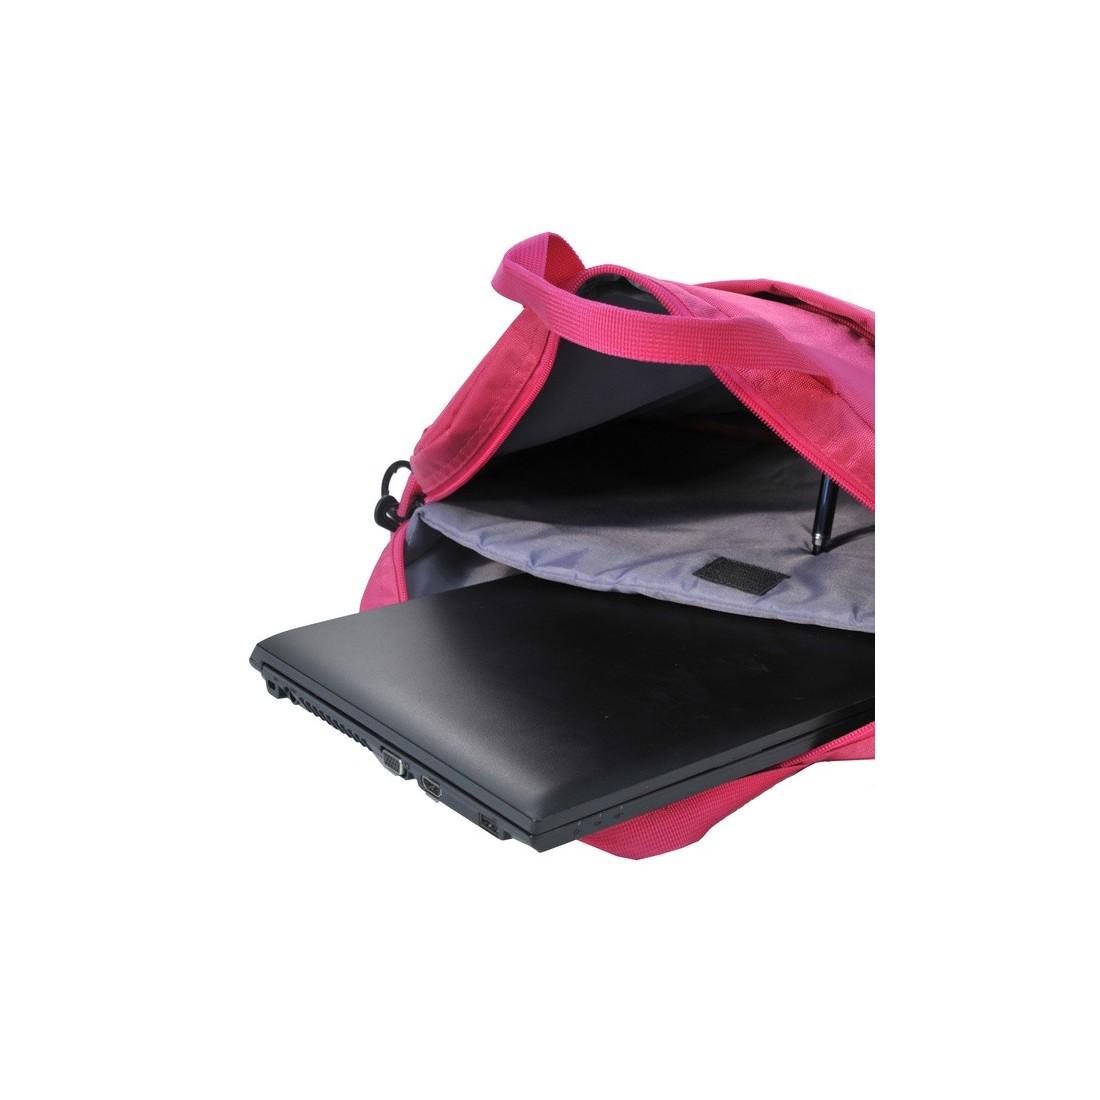 Torba na laptop różowa - plecak-tornister.pl